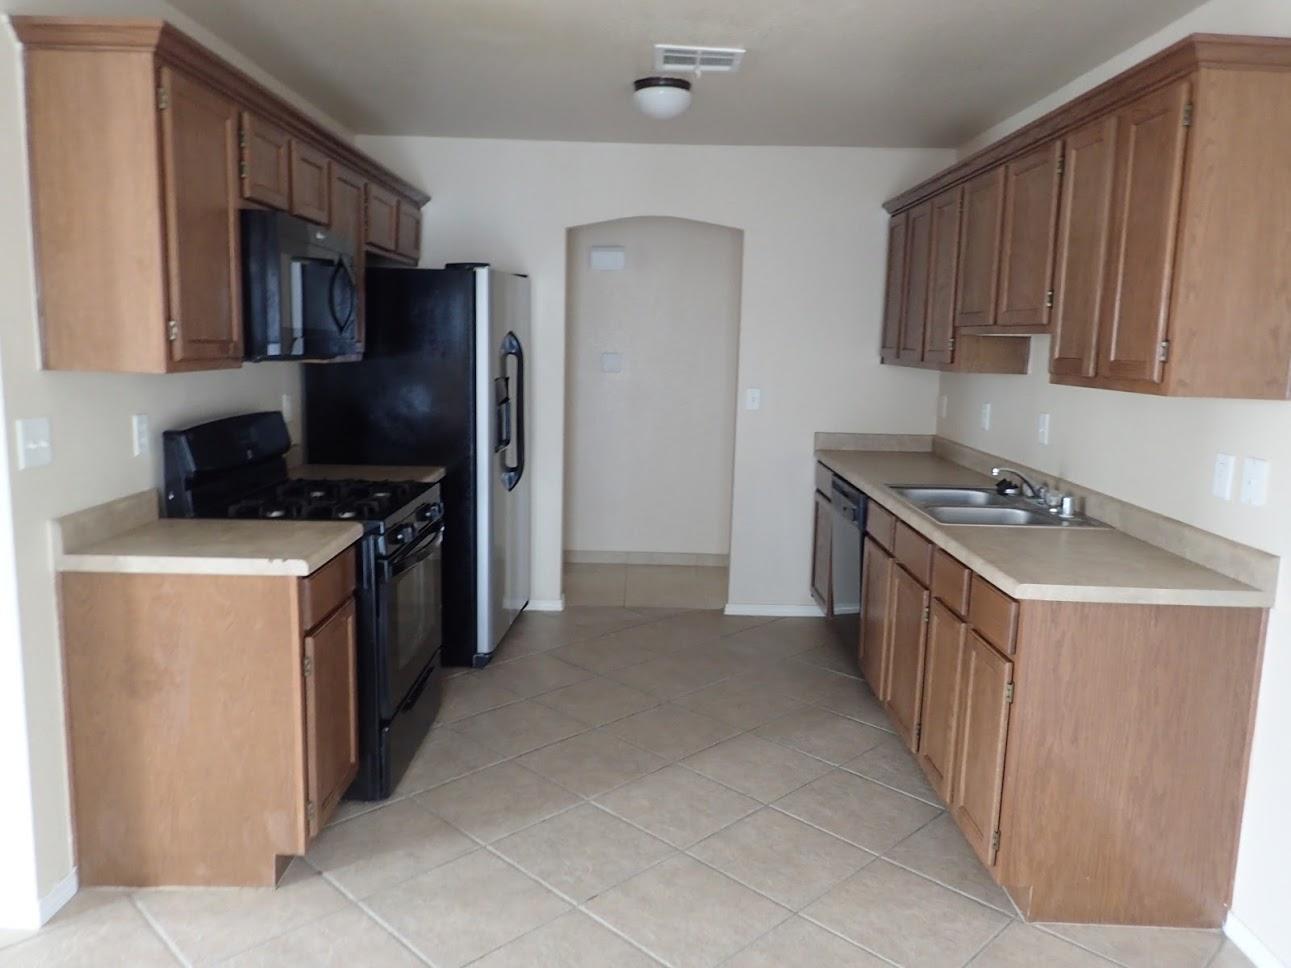 4608 LORENZO PONCE, El Paso, Texas 79938, 4 Bedrooms Bedrooms, ,2 BathroomsBathrooms,Residential Rental,For Rent,LORENZO PONCE,839254